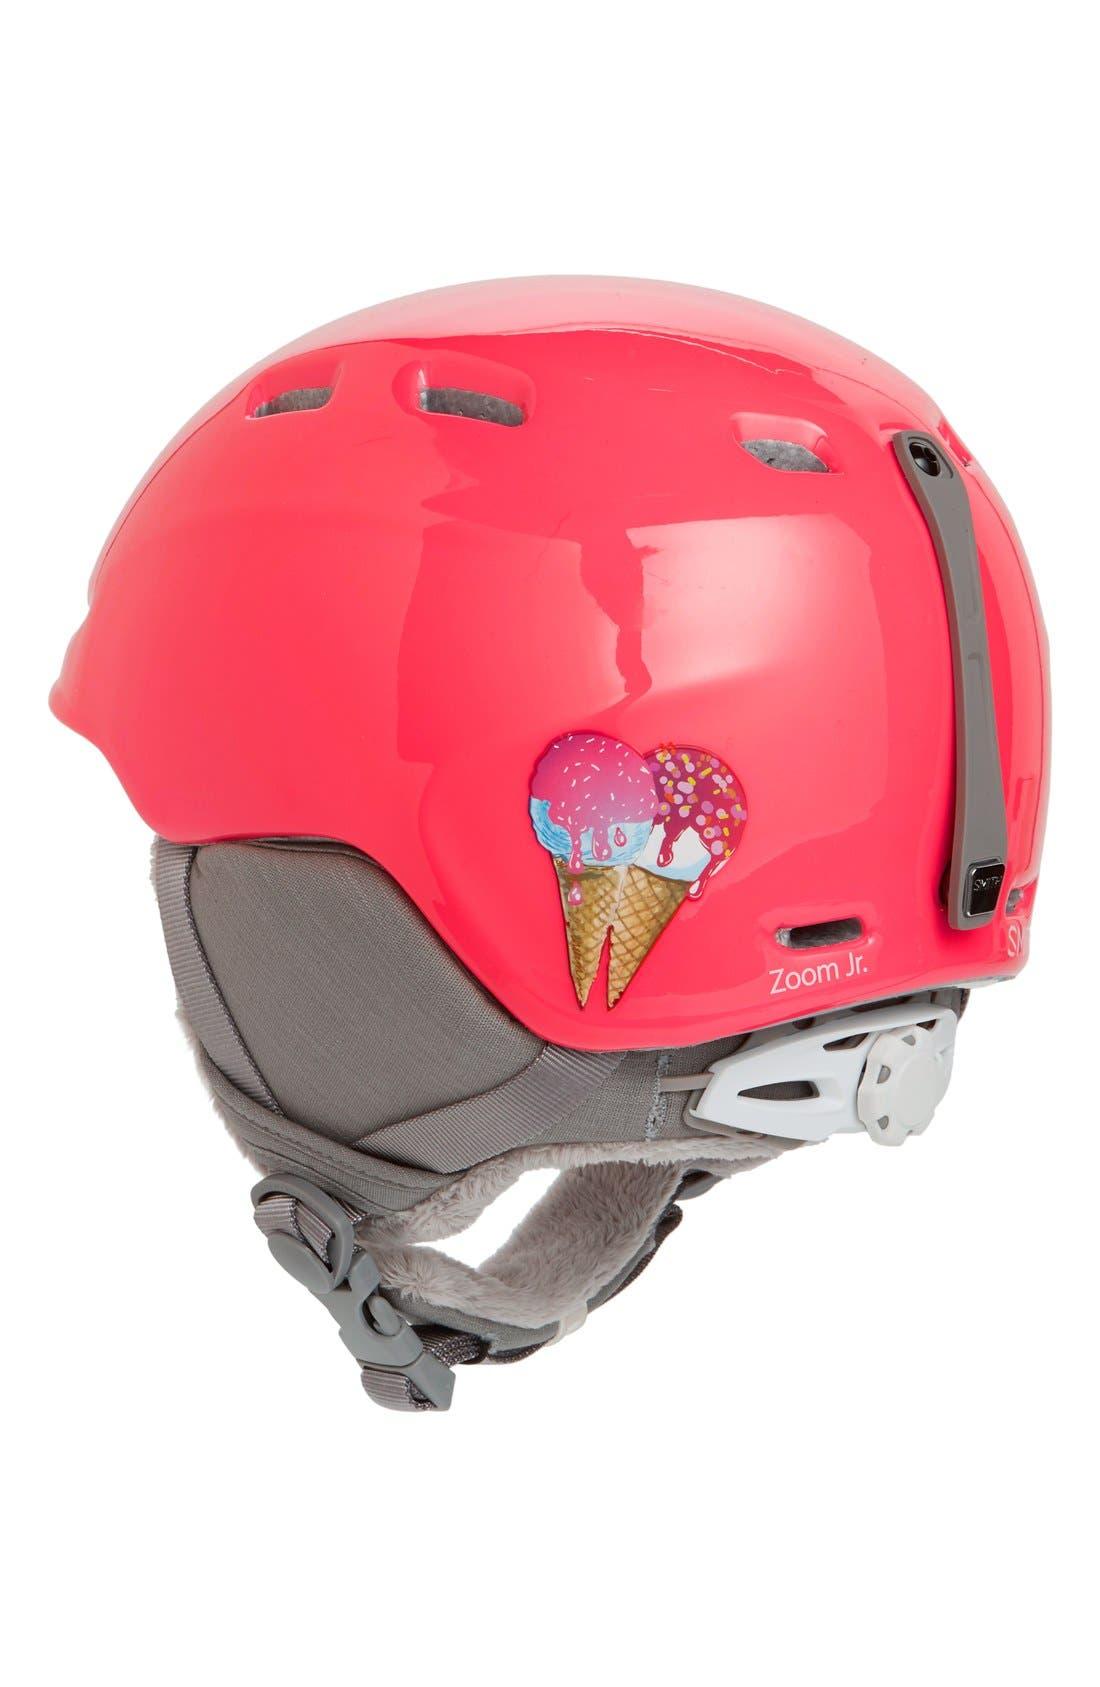 'Zoom Jr.' Snow Helmet,                             Alternate thumbnail 3, color,